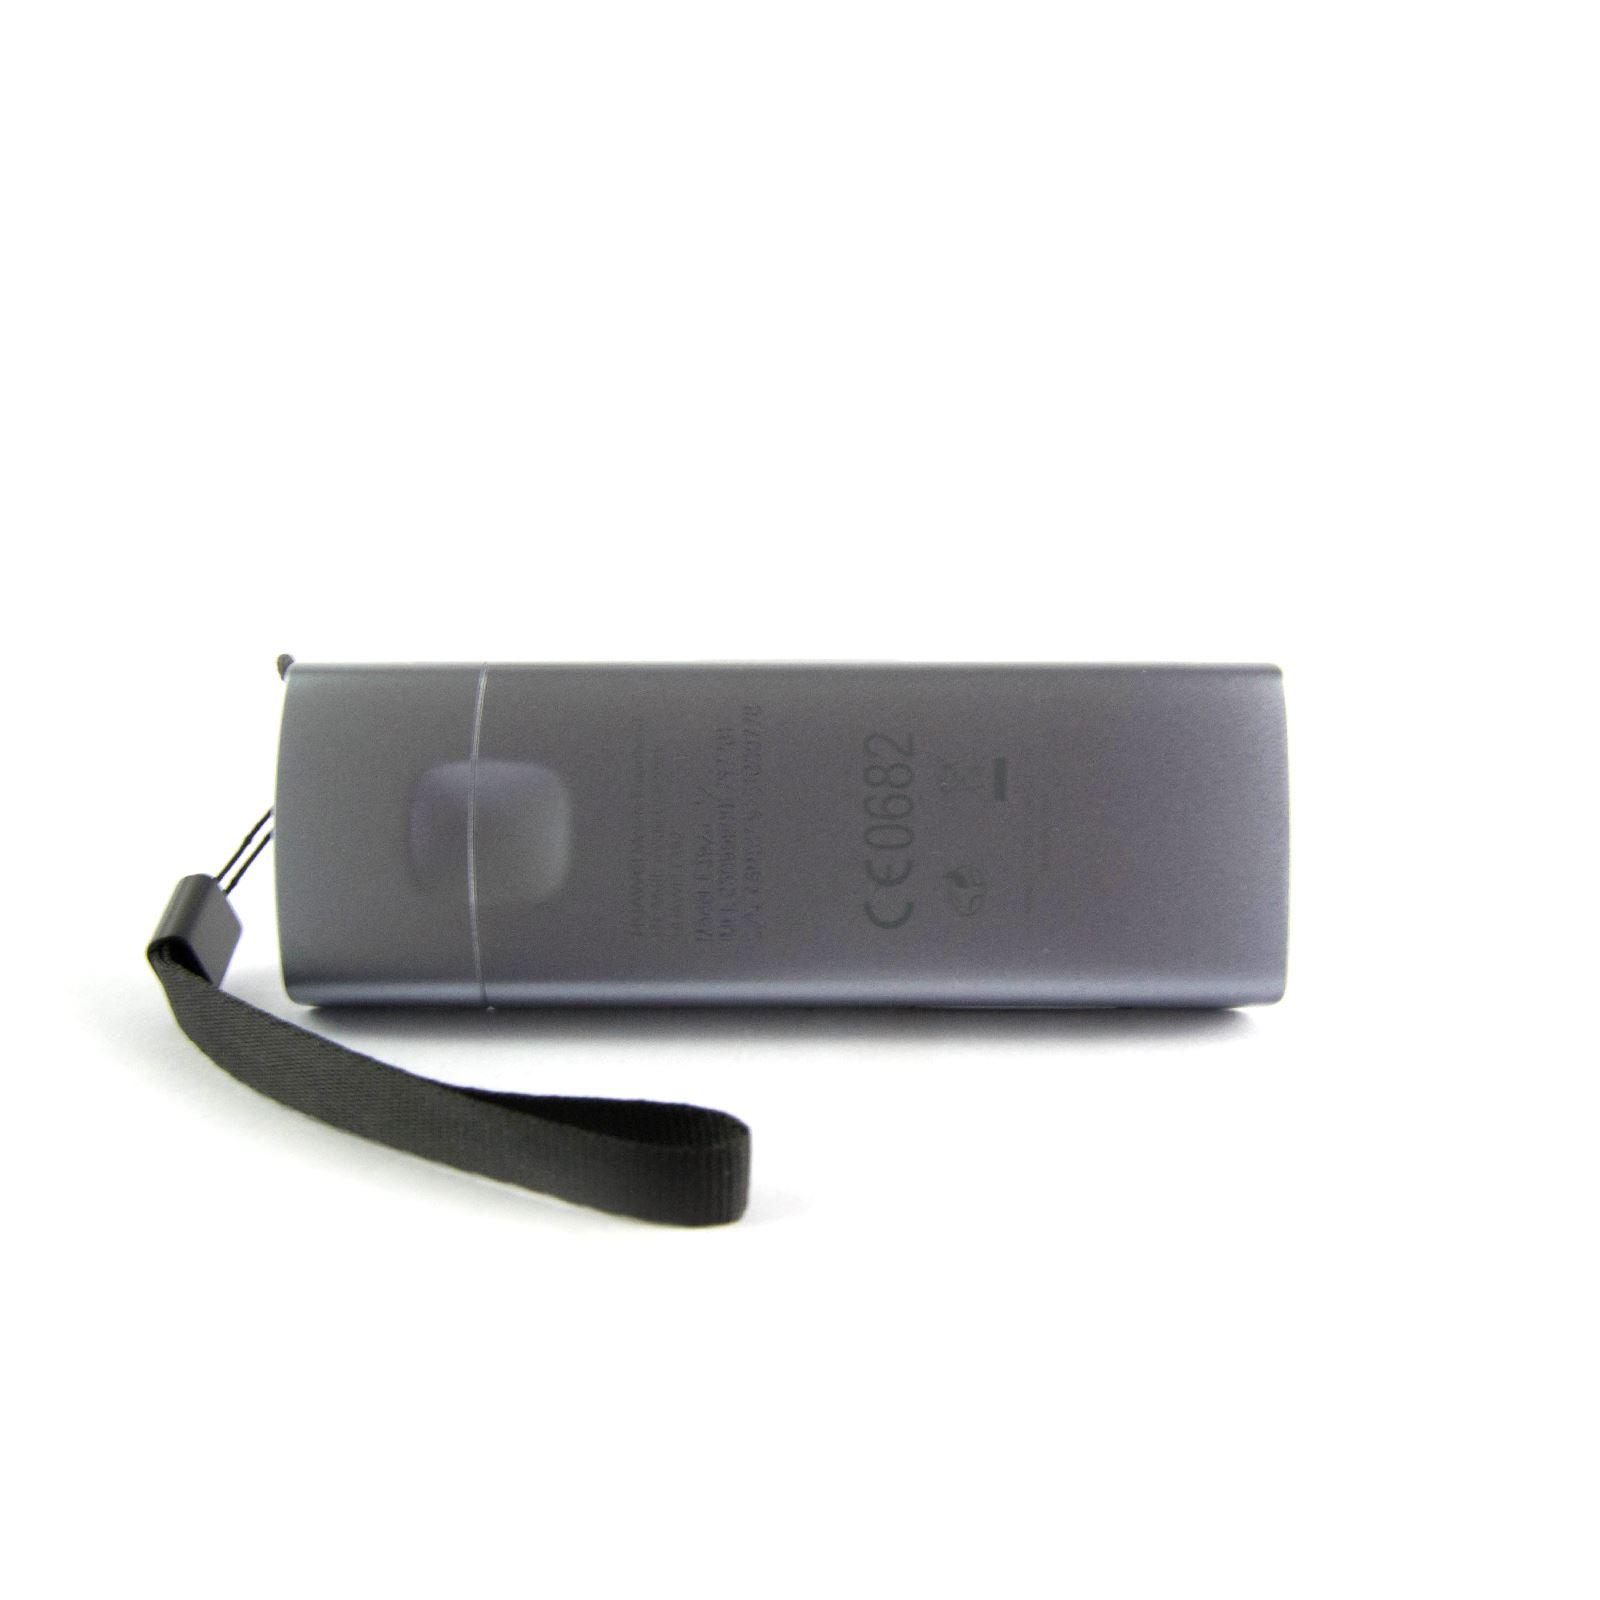 huawei e392 mobile broadband lte unlocked 4g usb stick. Black Bedroom Furniture Sets. Home Design Ideas